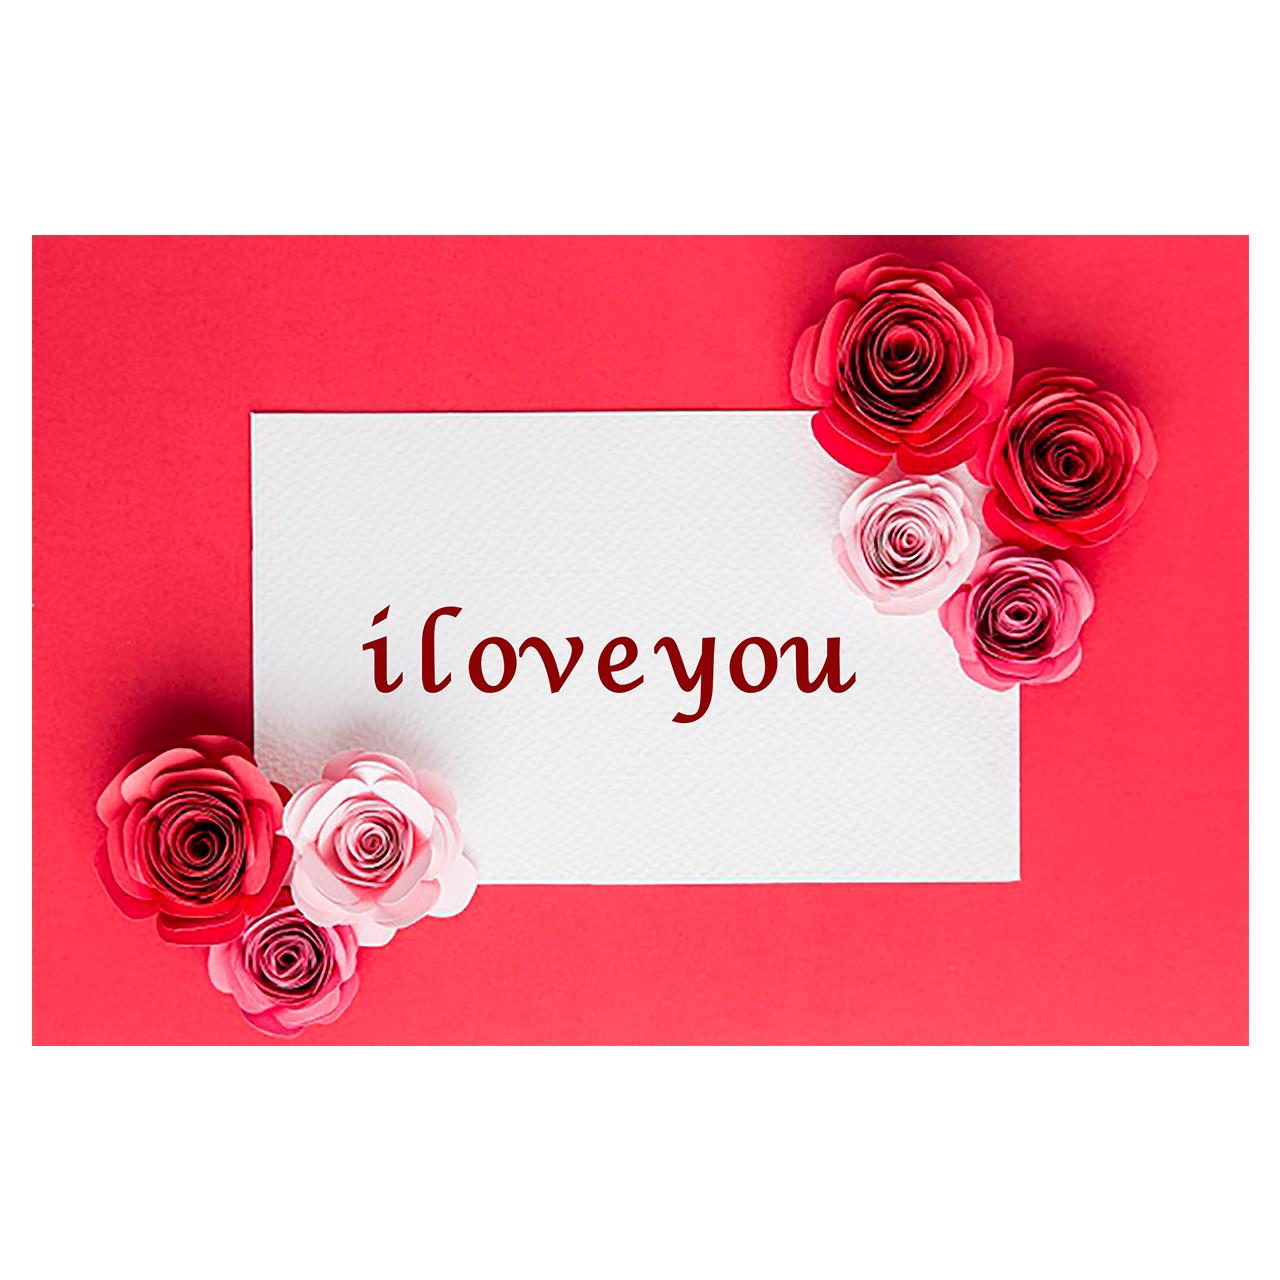 کارت پستال ماهتاب طرح عاشقتم دوست دارم i love you کد 1910